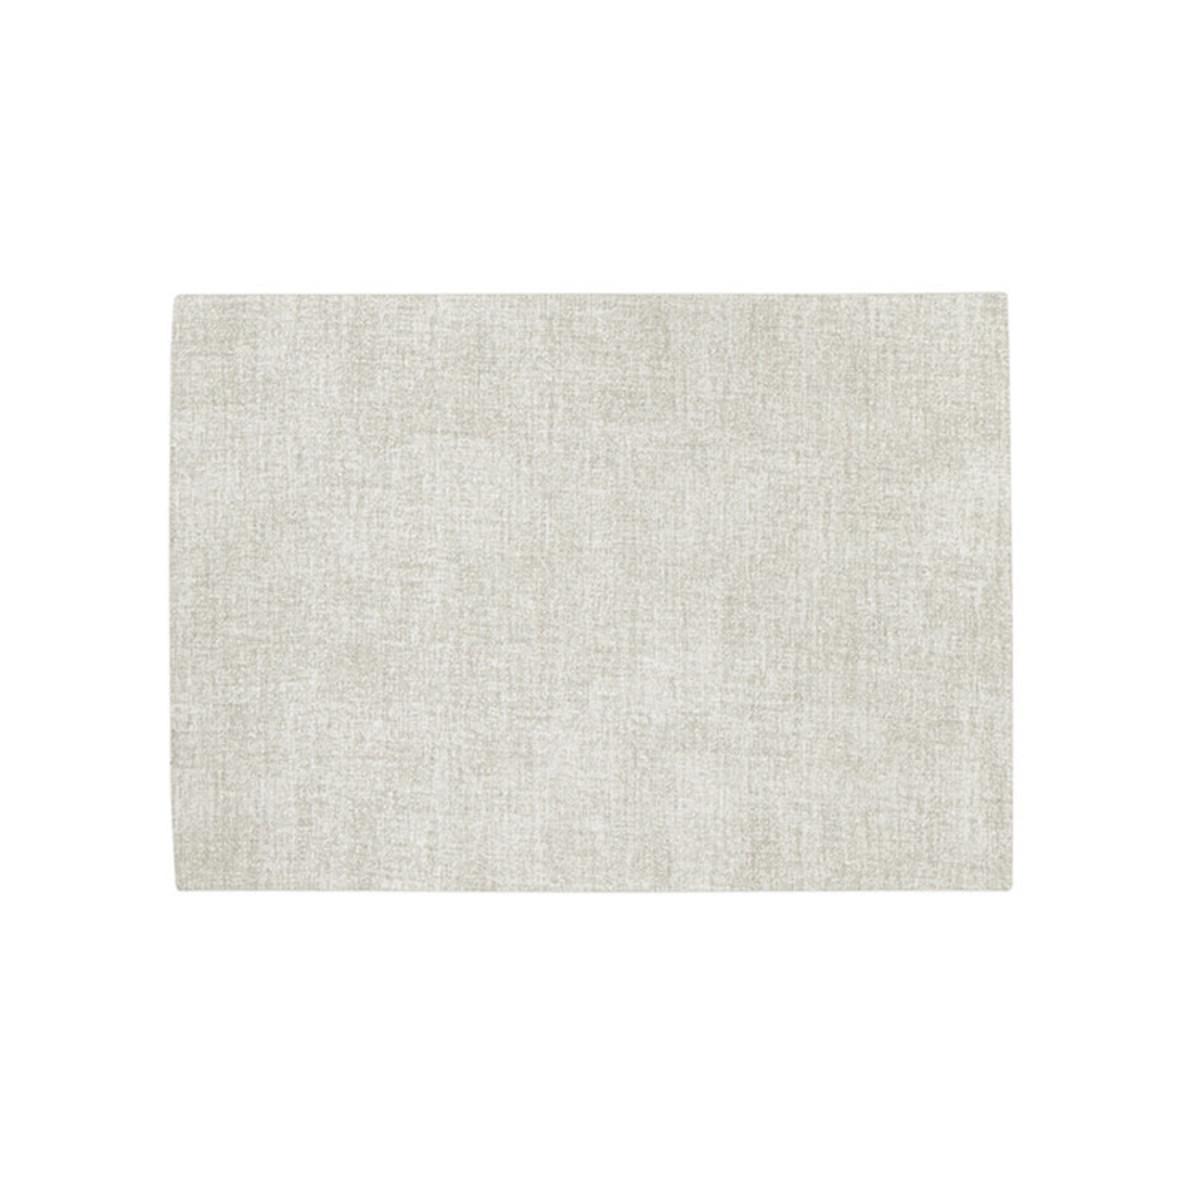 Percept Rev Luxe Vinyl Placemat, Linen